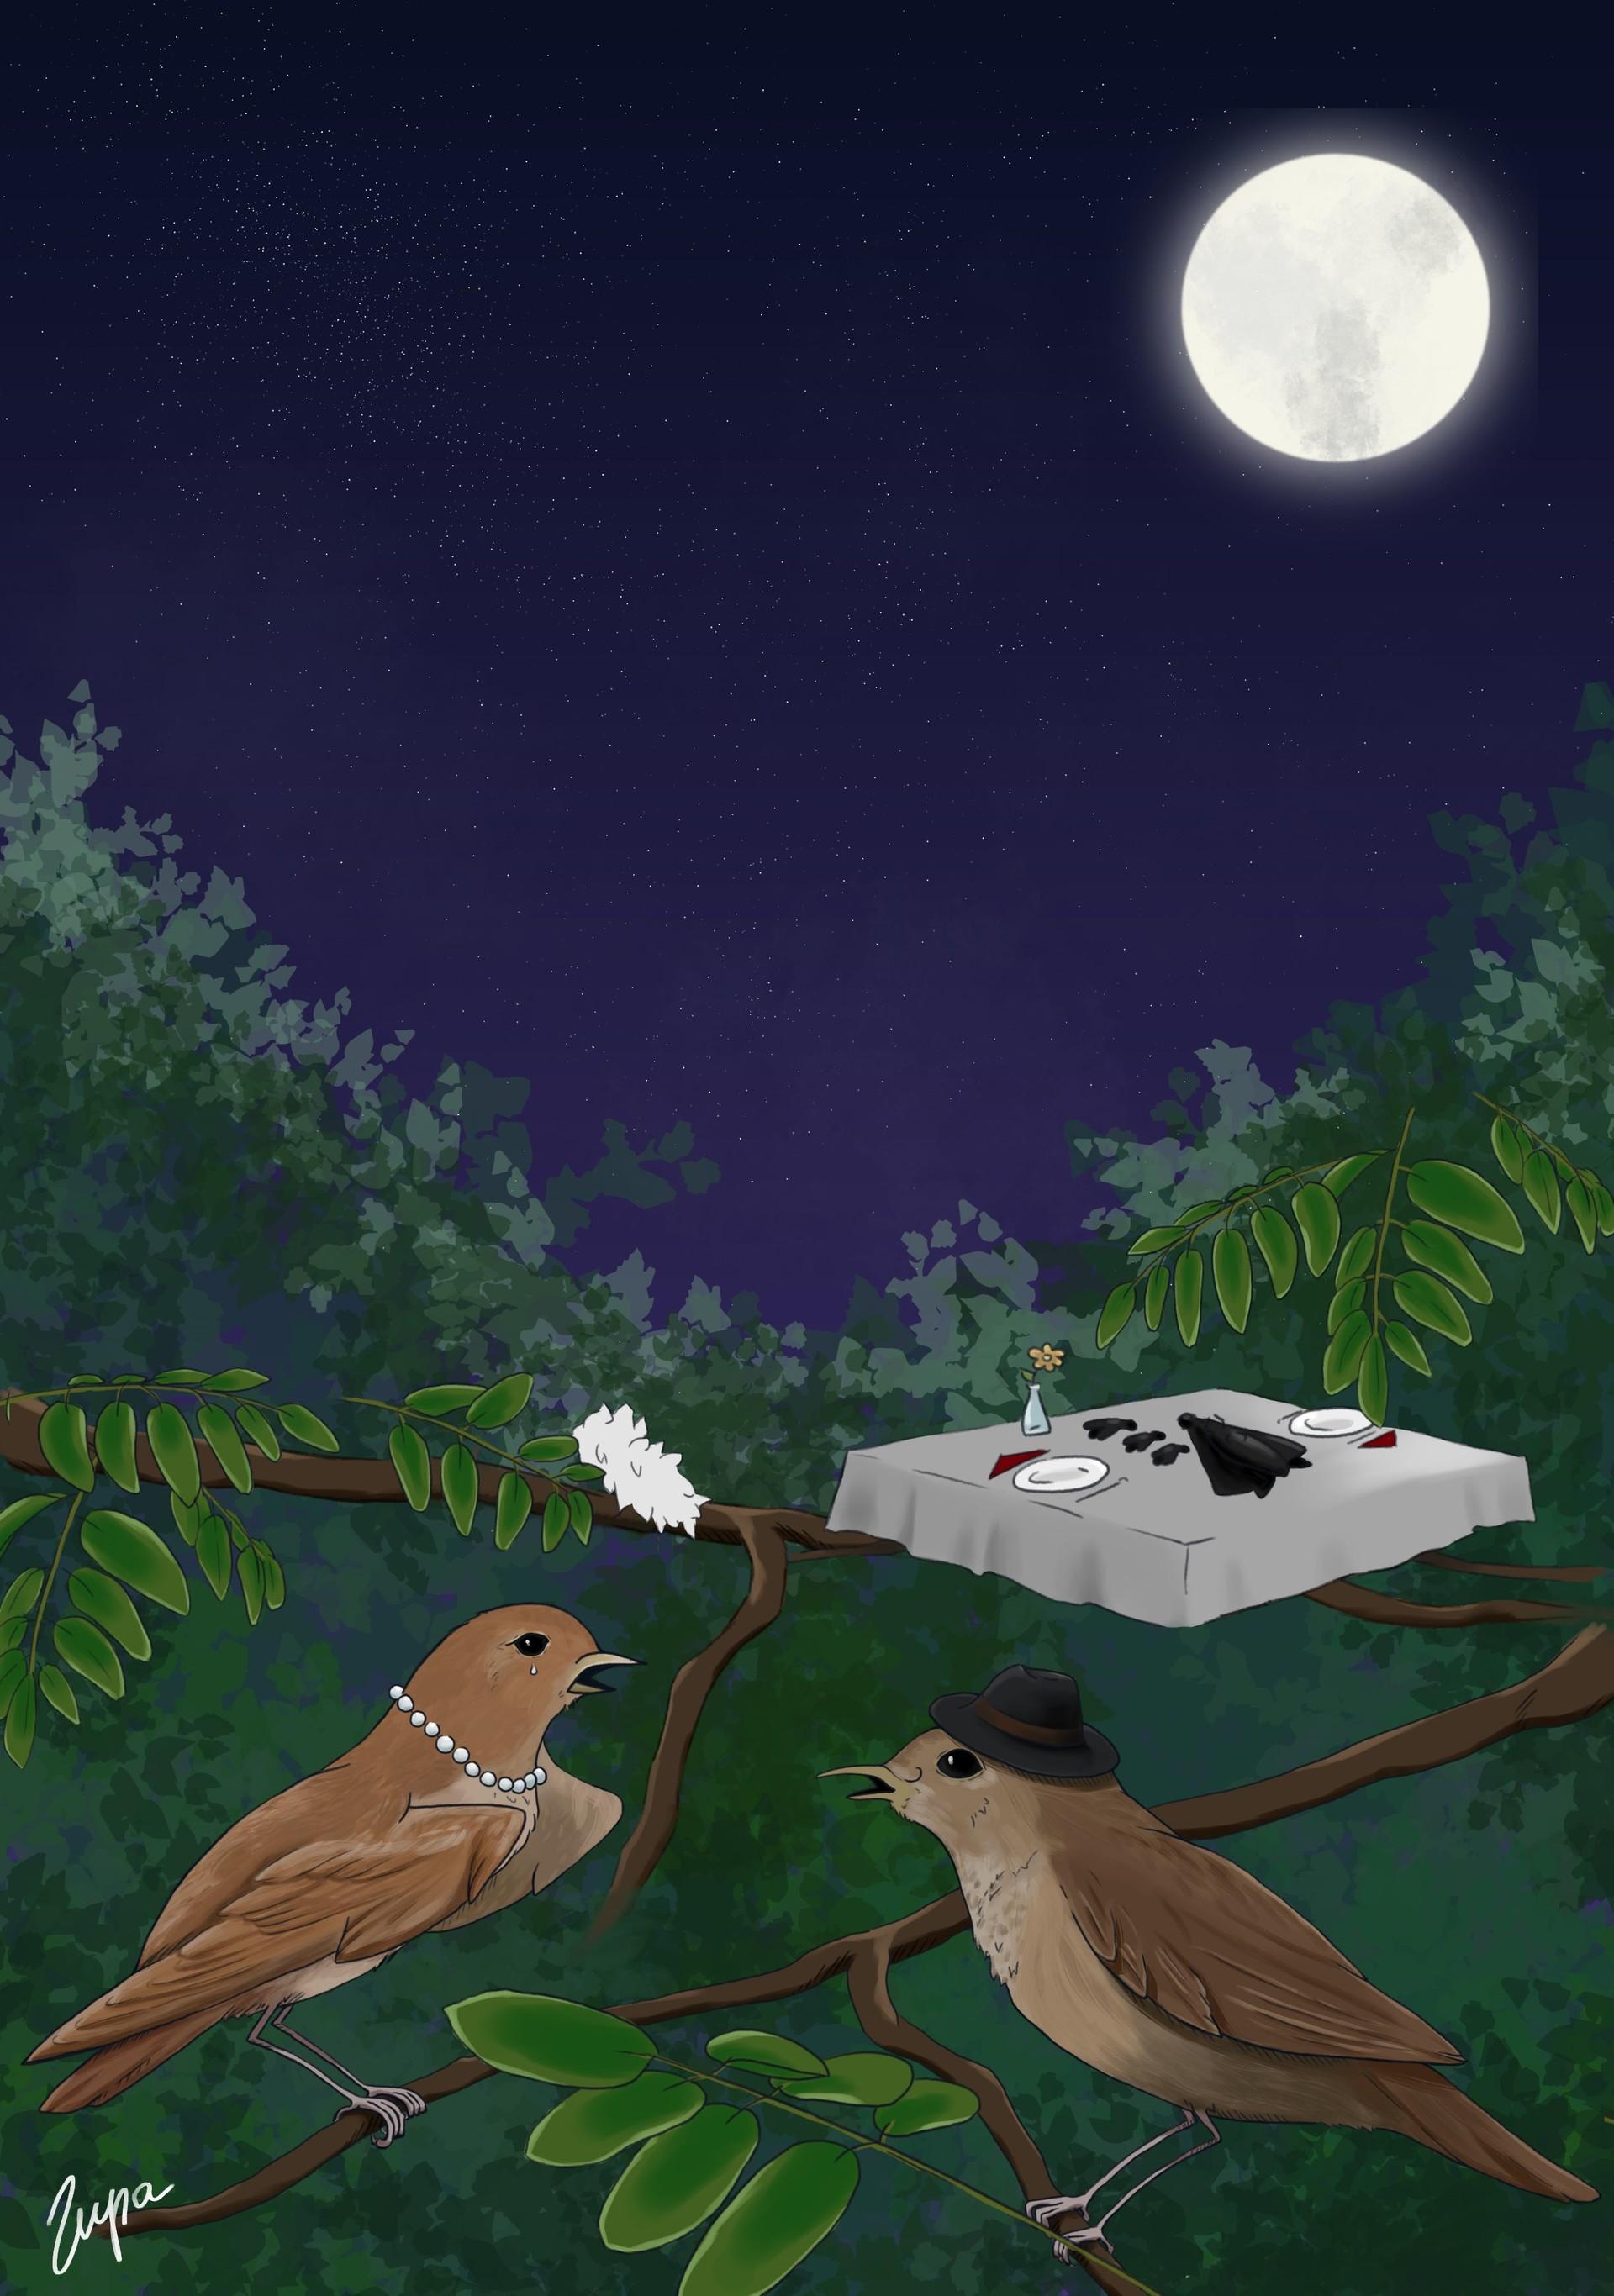 Artstation Illustrations For Childrens Poems Małgorzata